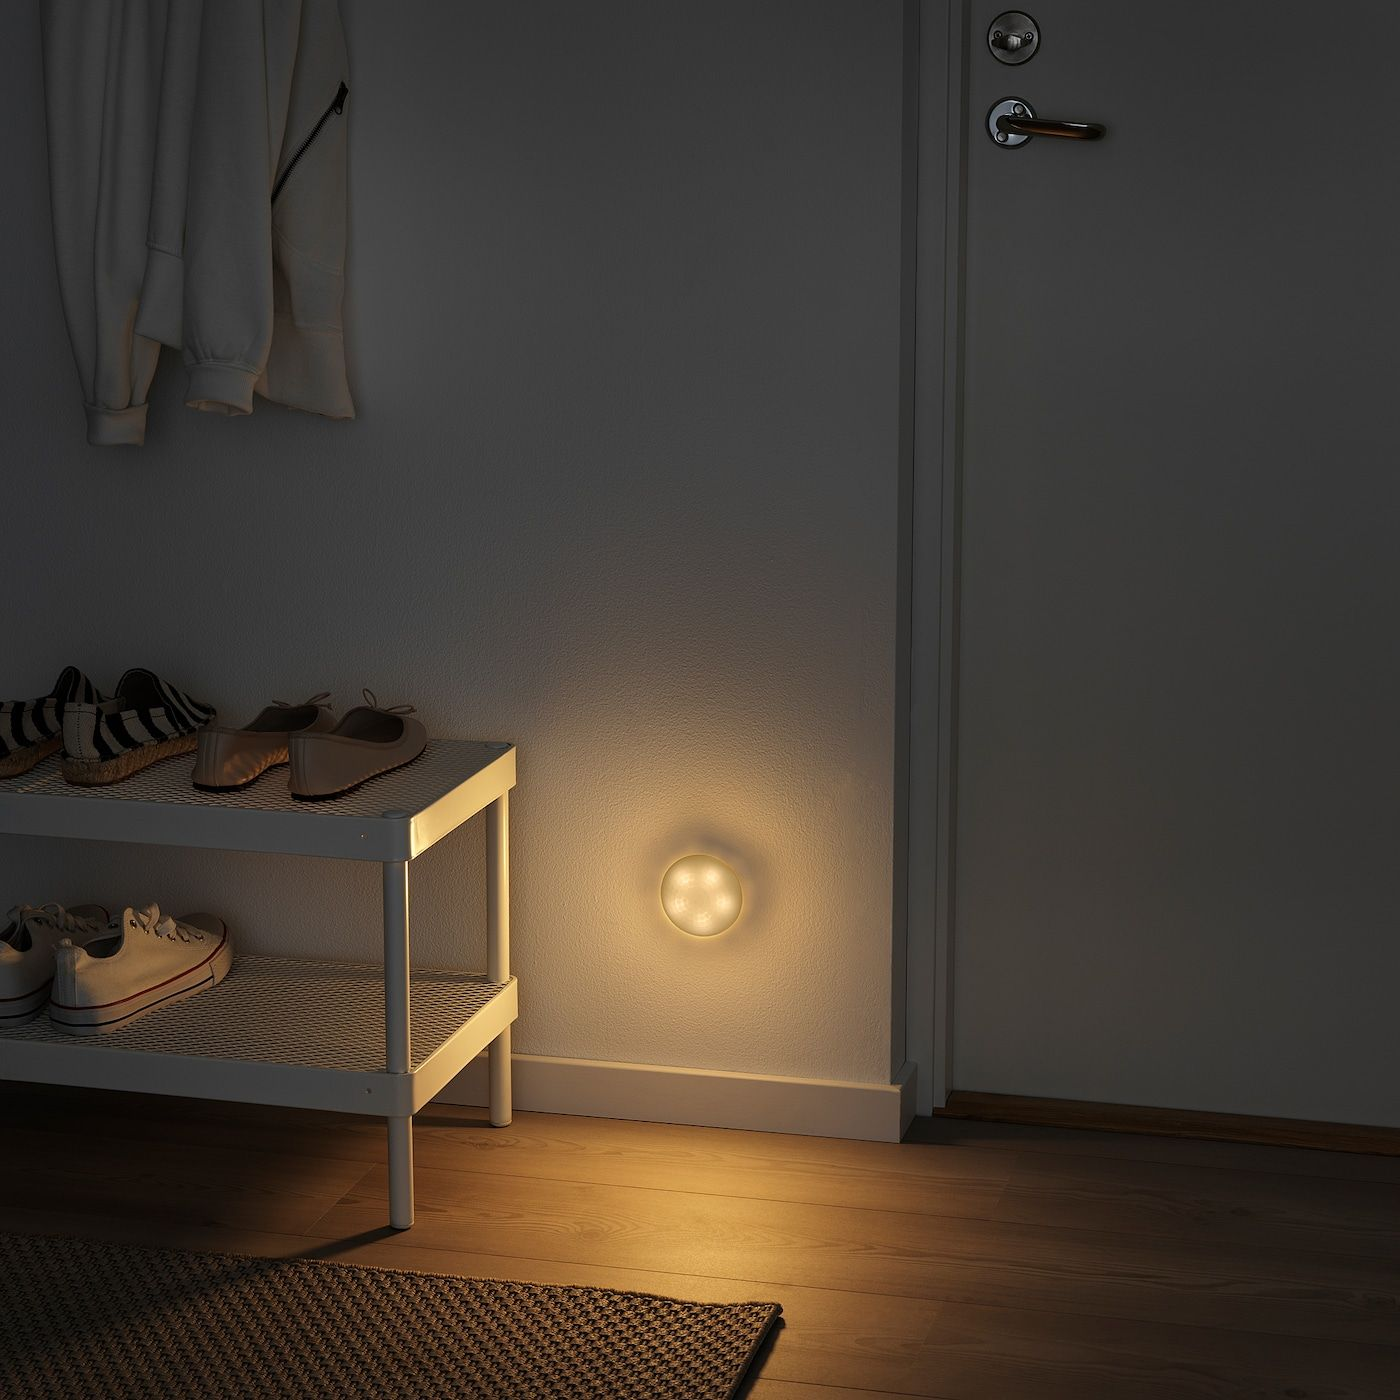 Molgan Leuchte Led Weiss Batteriebetrieben Ikea Osterreich In 2020 Led Led Leuchten Led Leuchtmittel